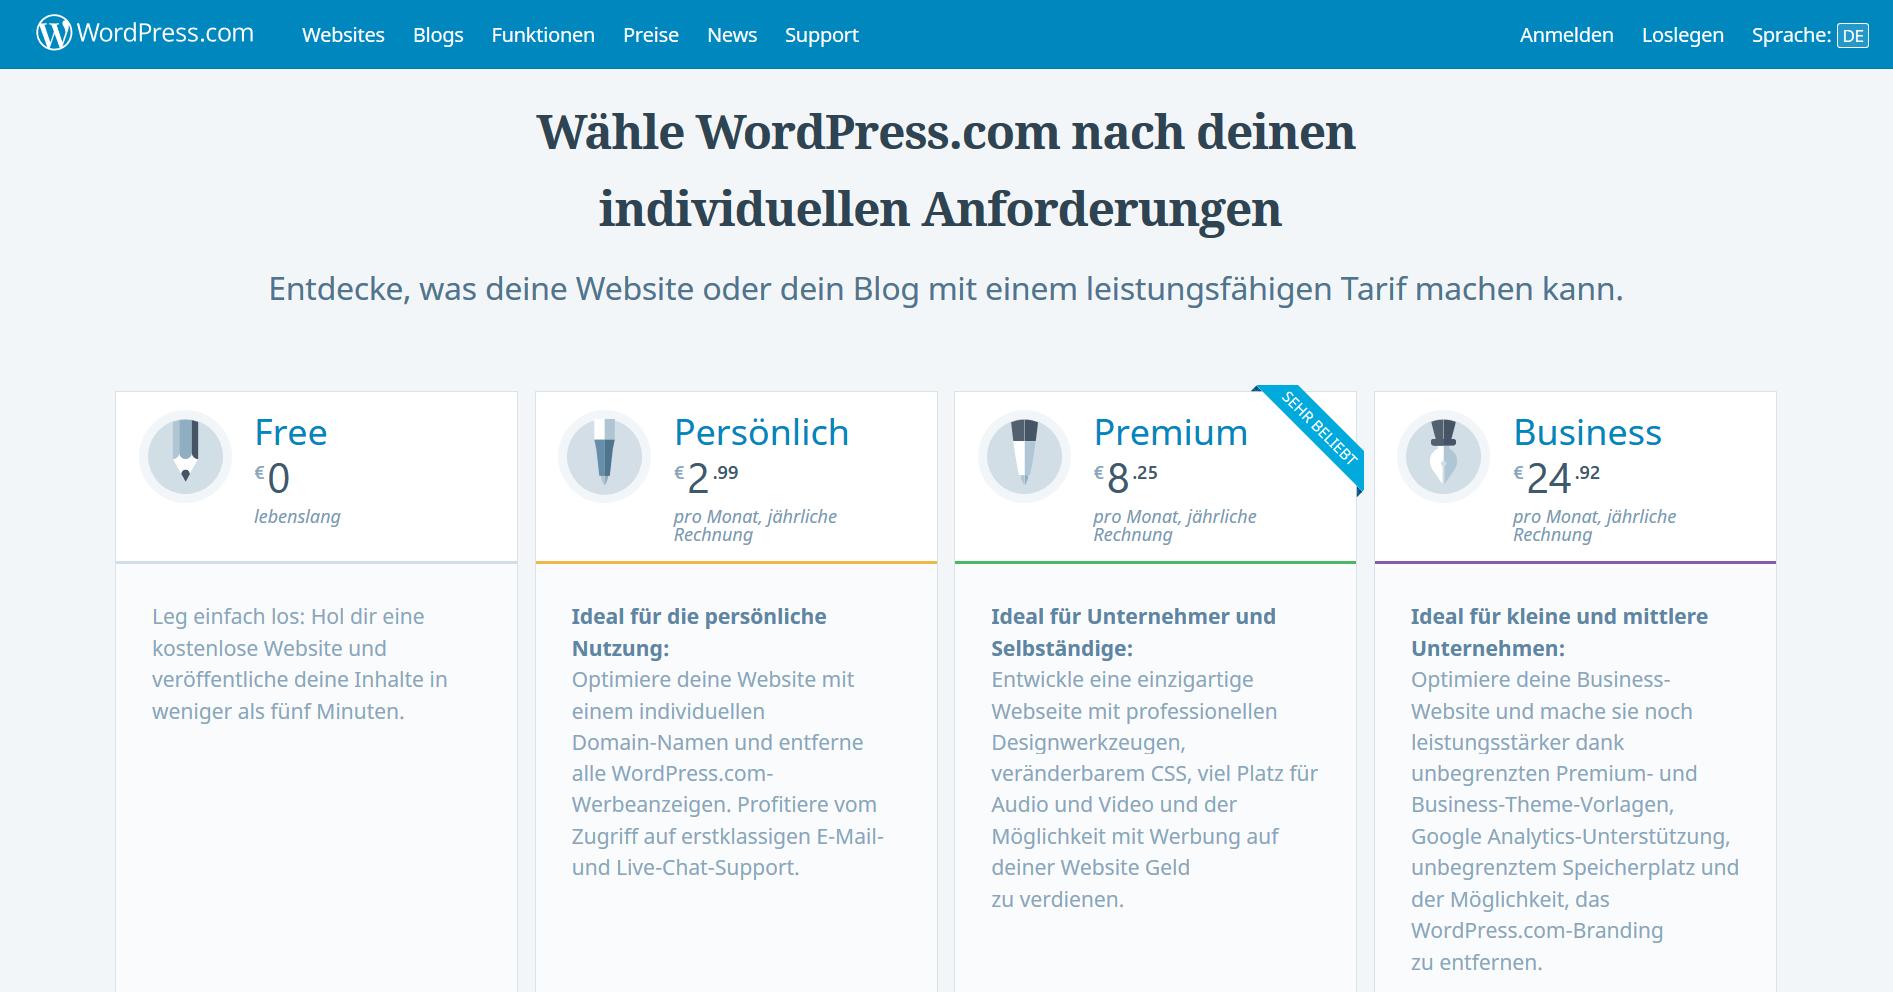 Screenshot der Tarife zu WordPress.com von michaelzeyen.com